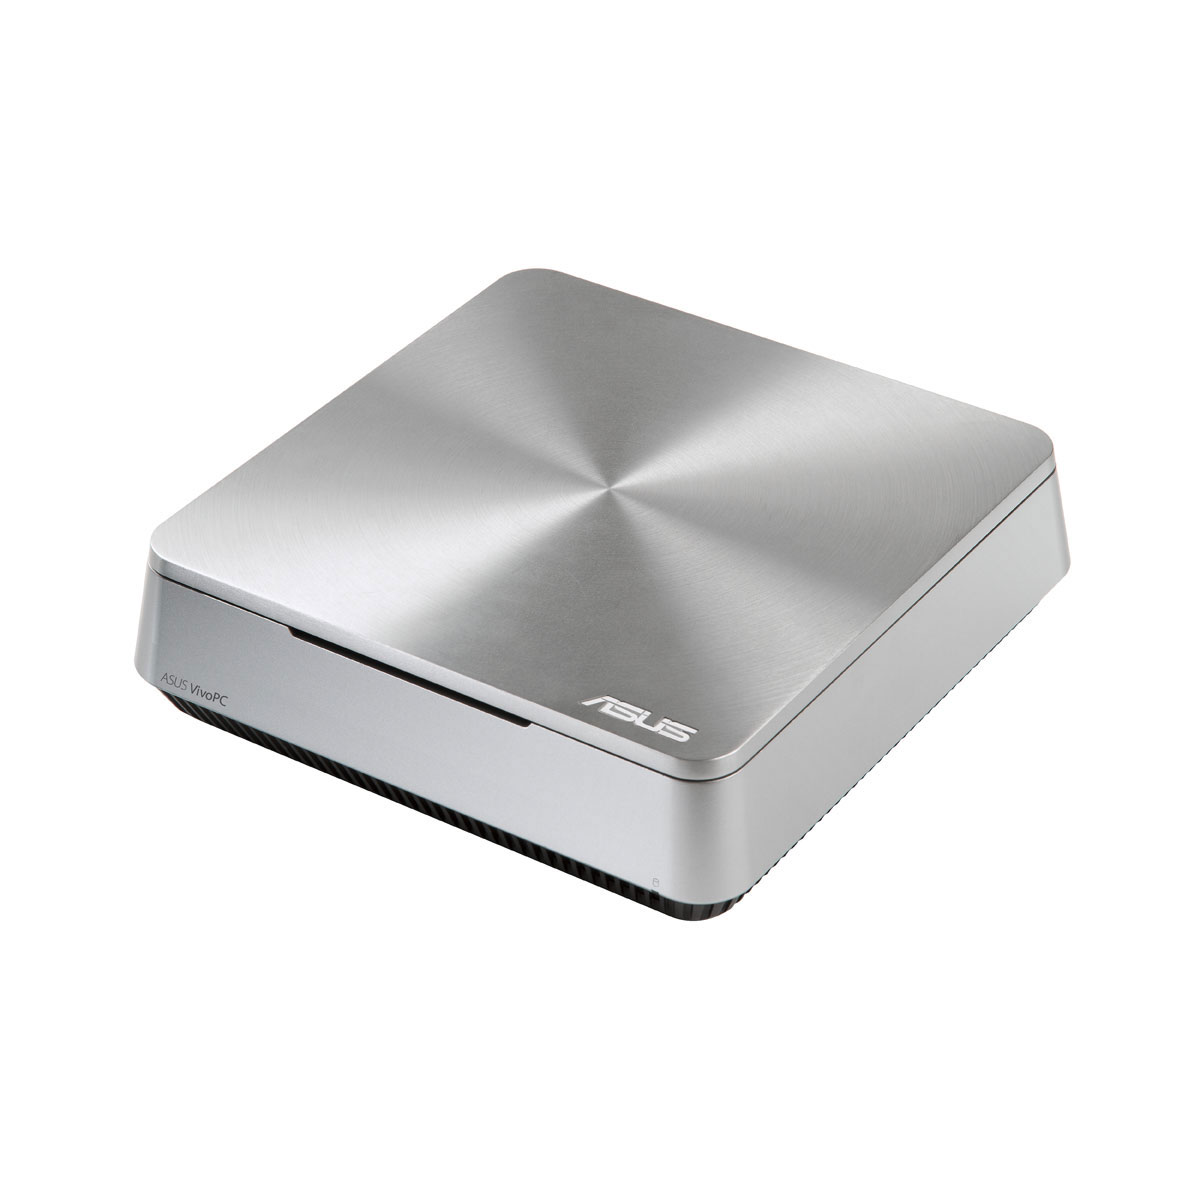 PC de bureau ASUS VivoPC-VM40B-S018K Intel Celeron 1007U 4 Go 500 Go Wi-Fi AC/Bluetooth Windows 8 64 bits (sans écran)